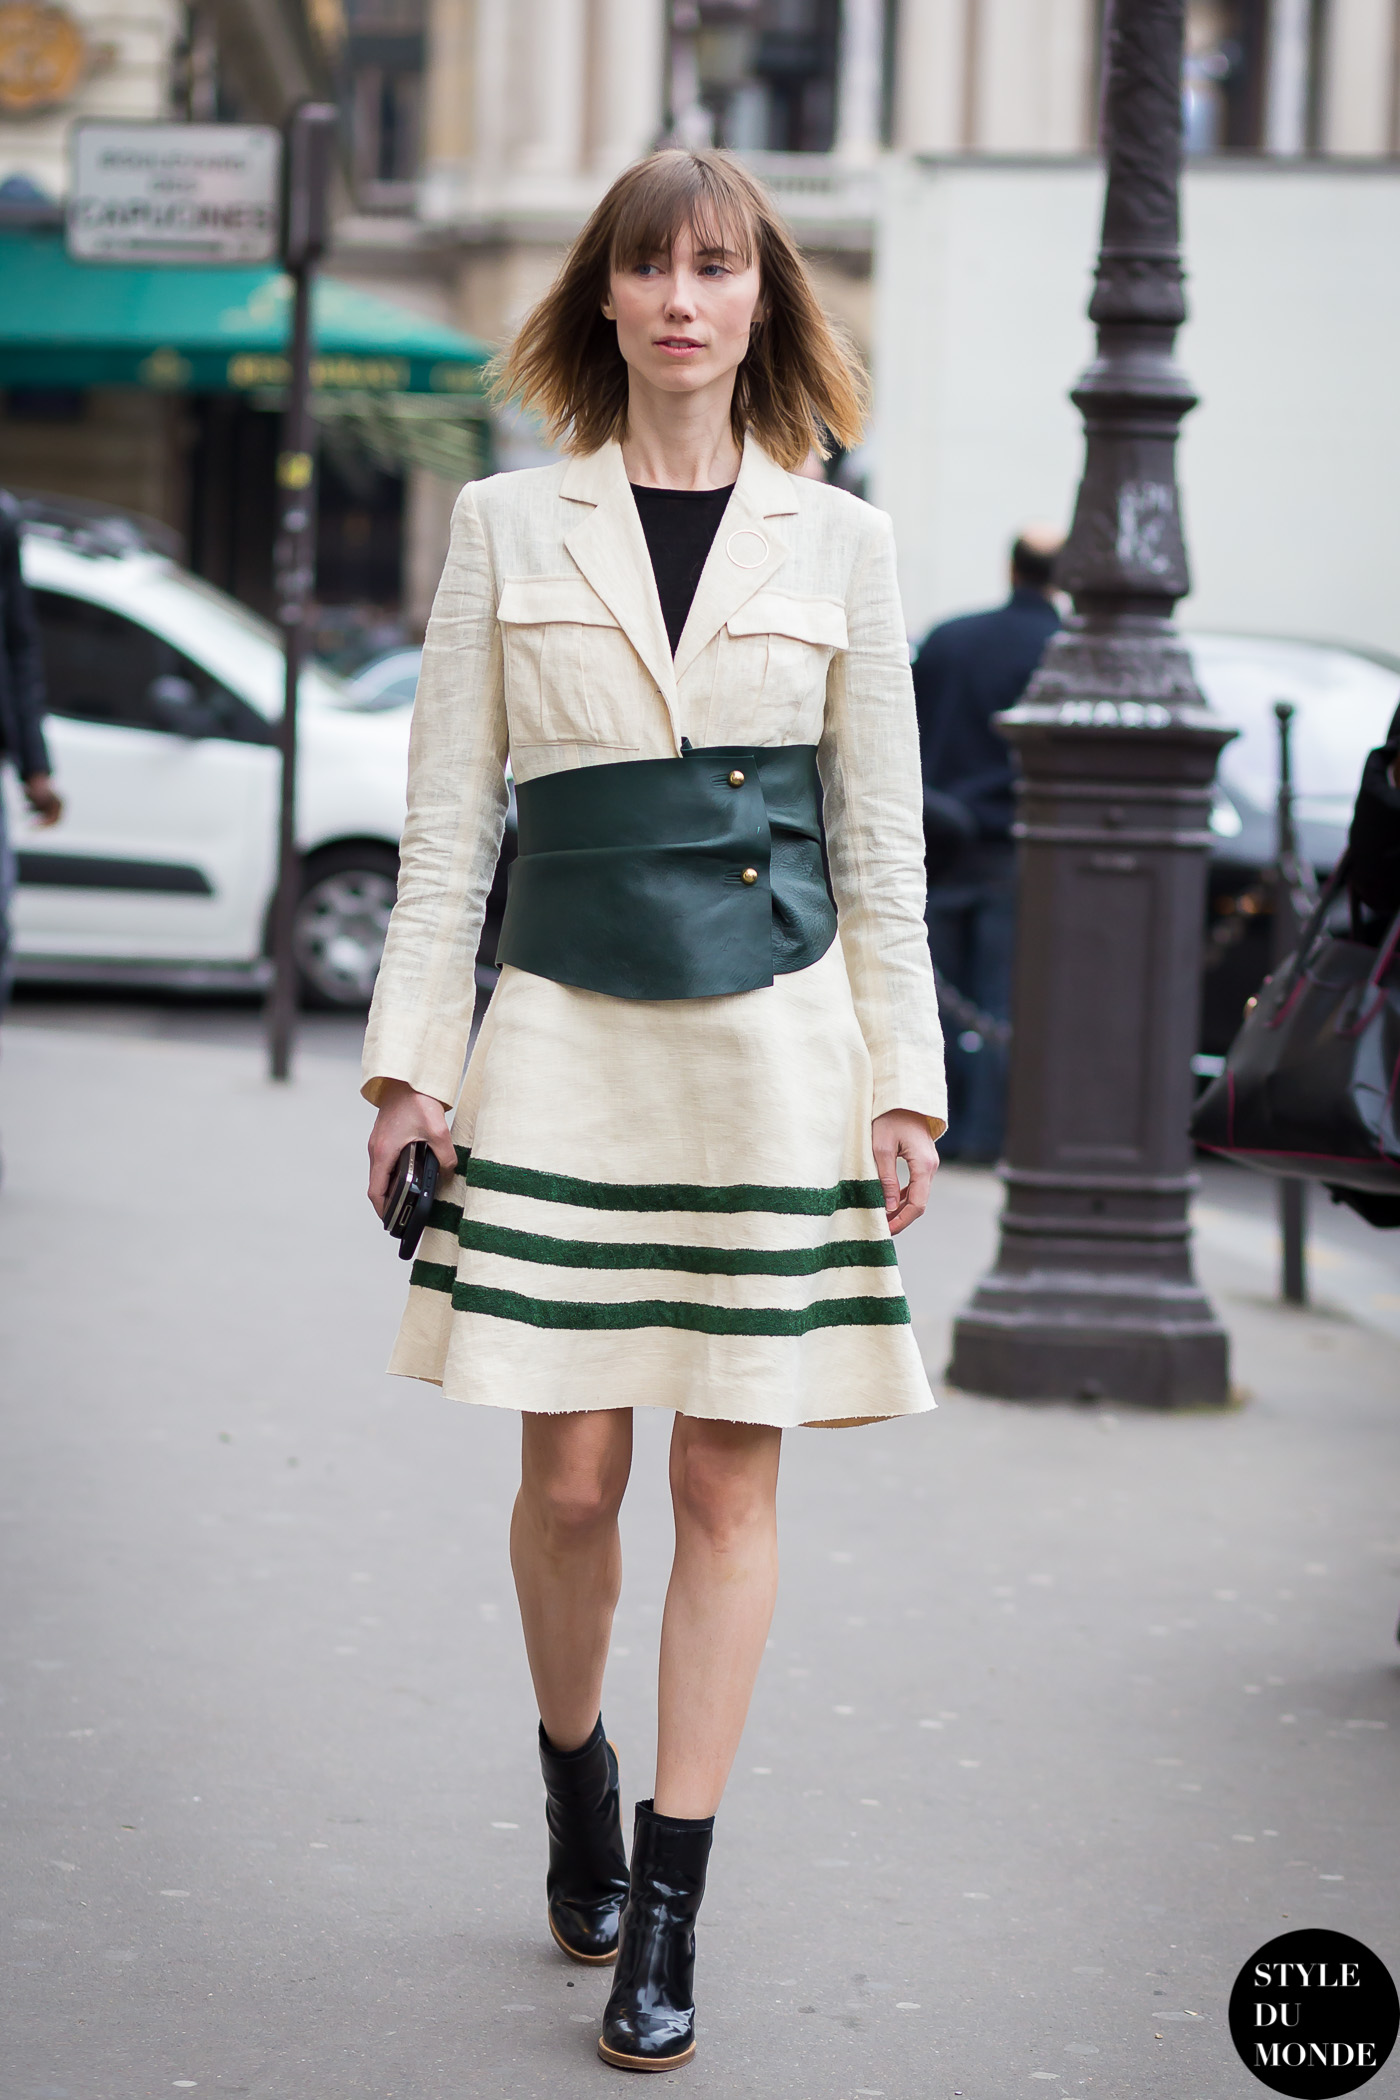 Paris Fashion Week FW 2015 Street Style: Stella Tennant